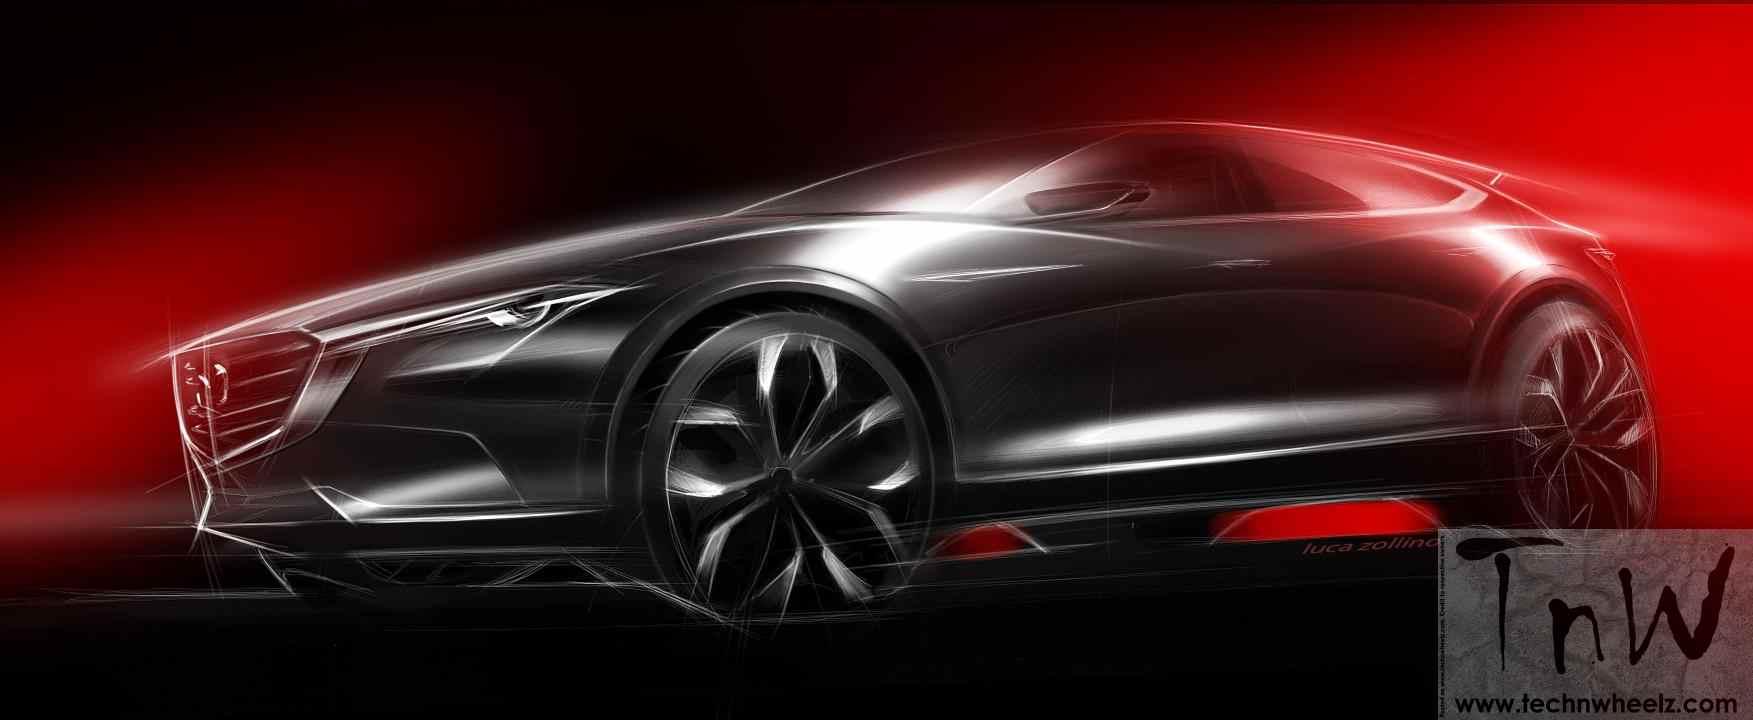 Mazda Koeru crossover SUV concept